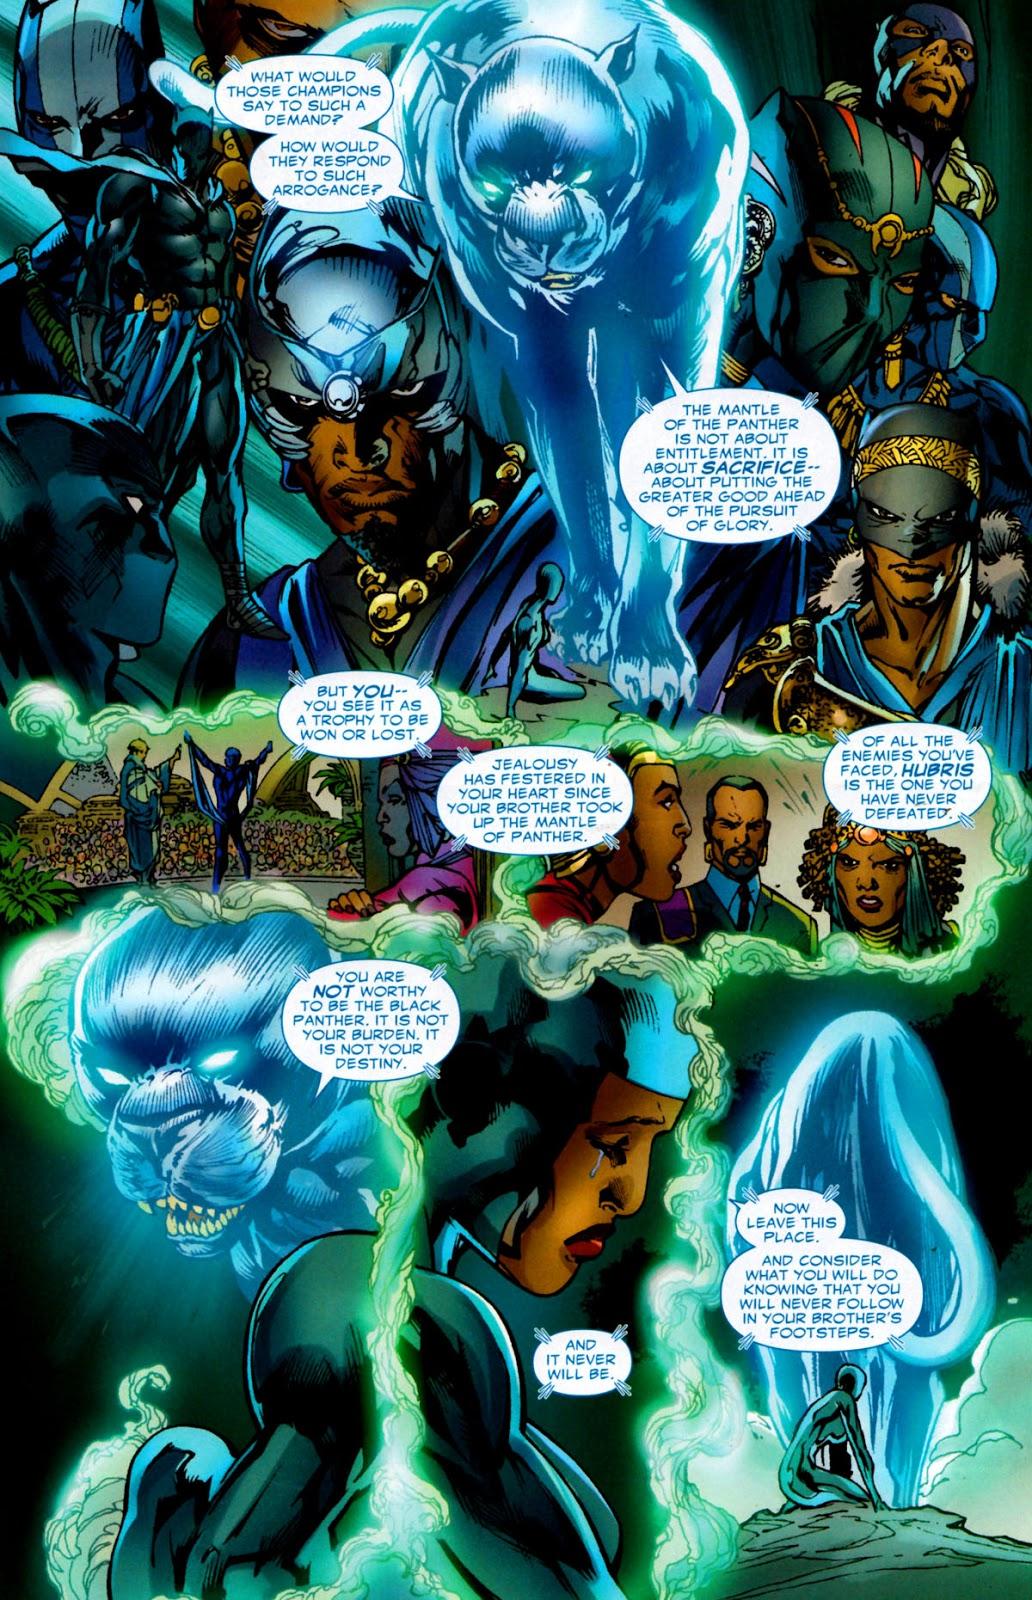 Shuri unworthy of Black Panther